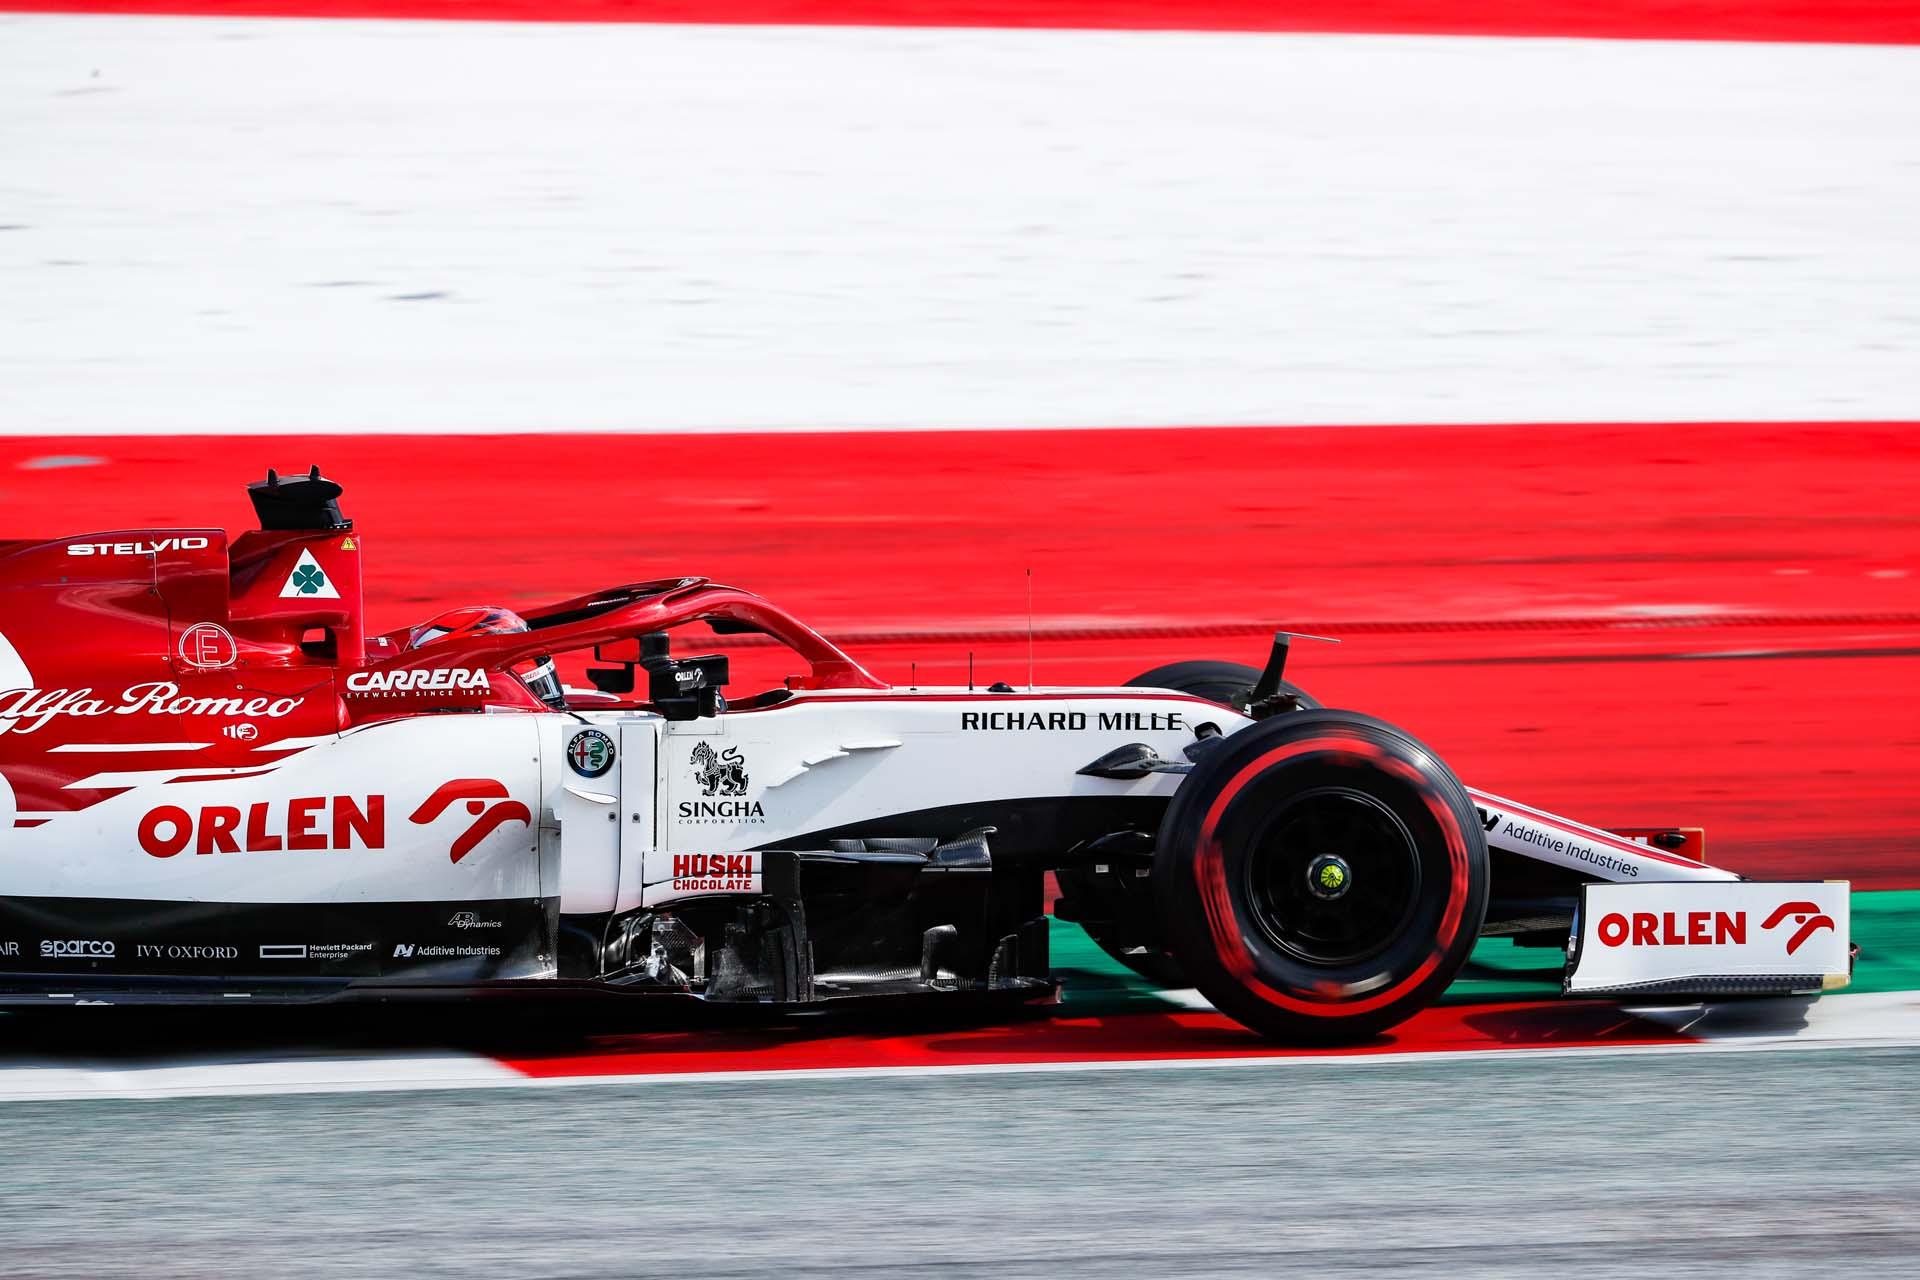 F1 - STYRIAN GRAND PRIX 2020